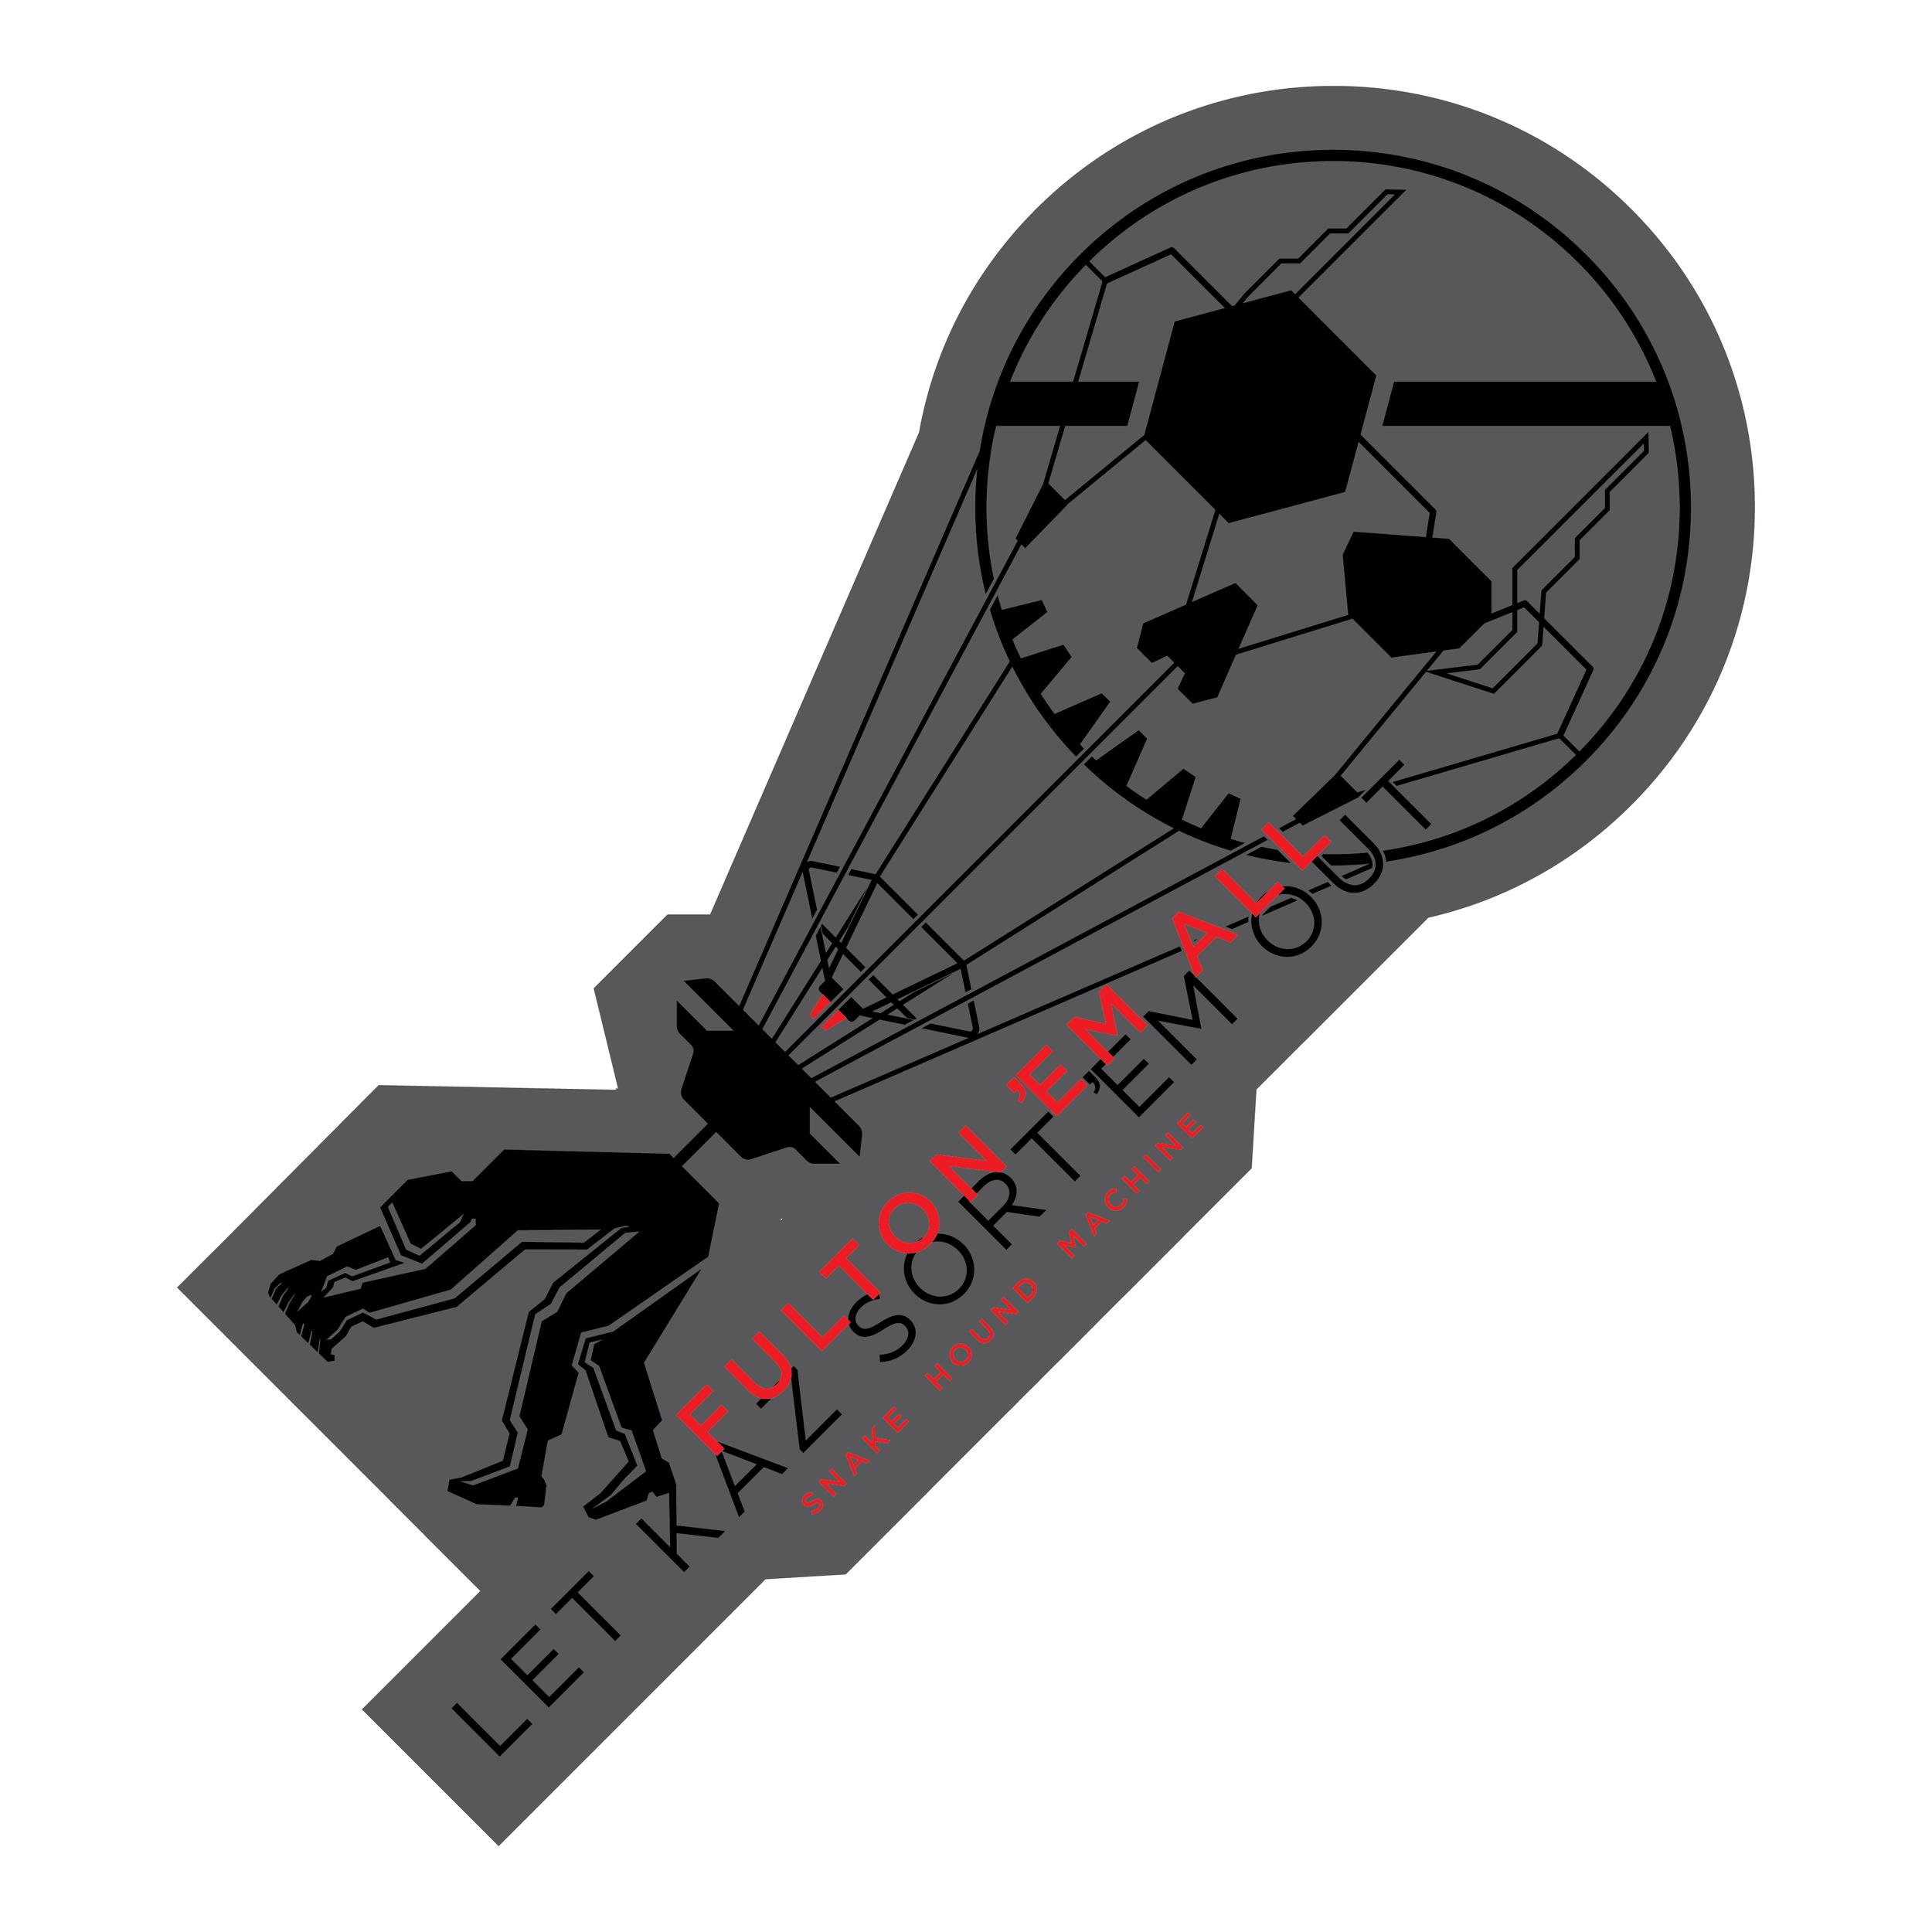 fulton-em-all-snakehoundmachine-owen-wilson-snake-hound-mgs-metal-gear-mgs-solidsnake-patch-grey-red-black-roberto-artist-orozco-design-studio-illustration-illustrator-vector-digital-geometric-outline.jpg